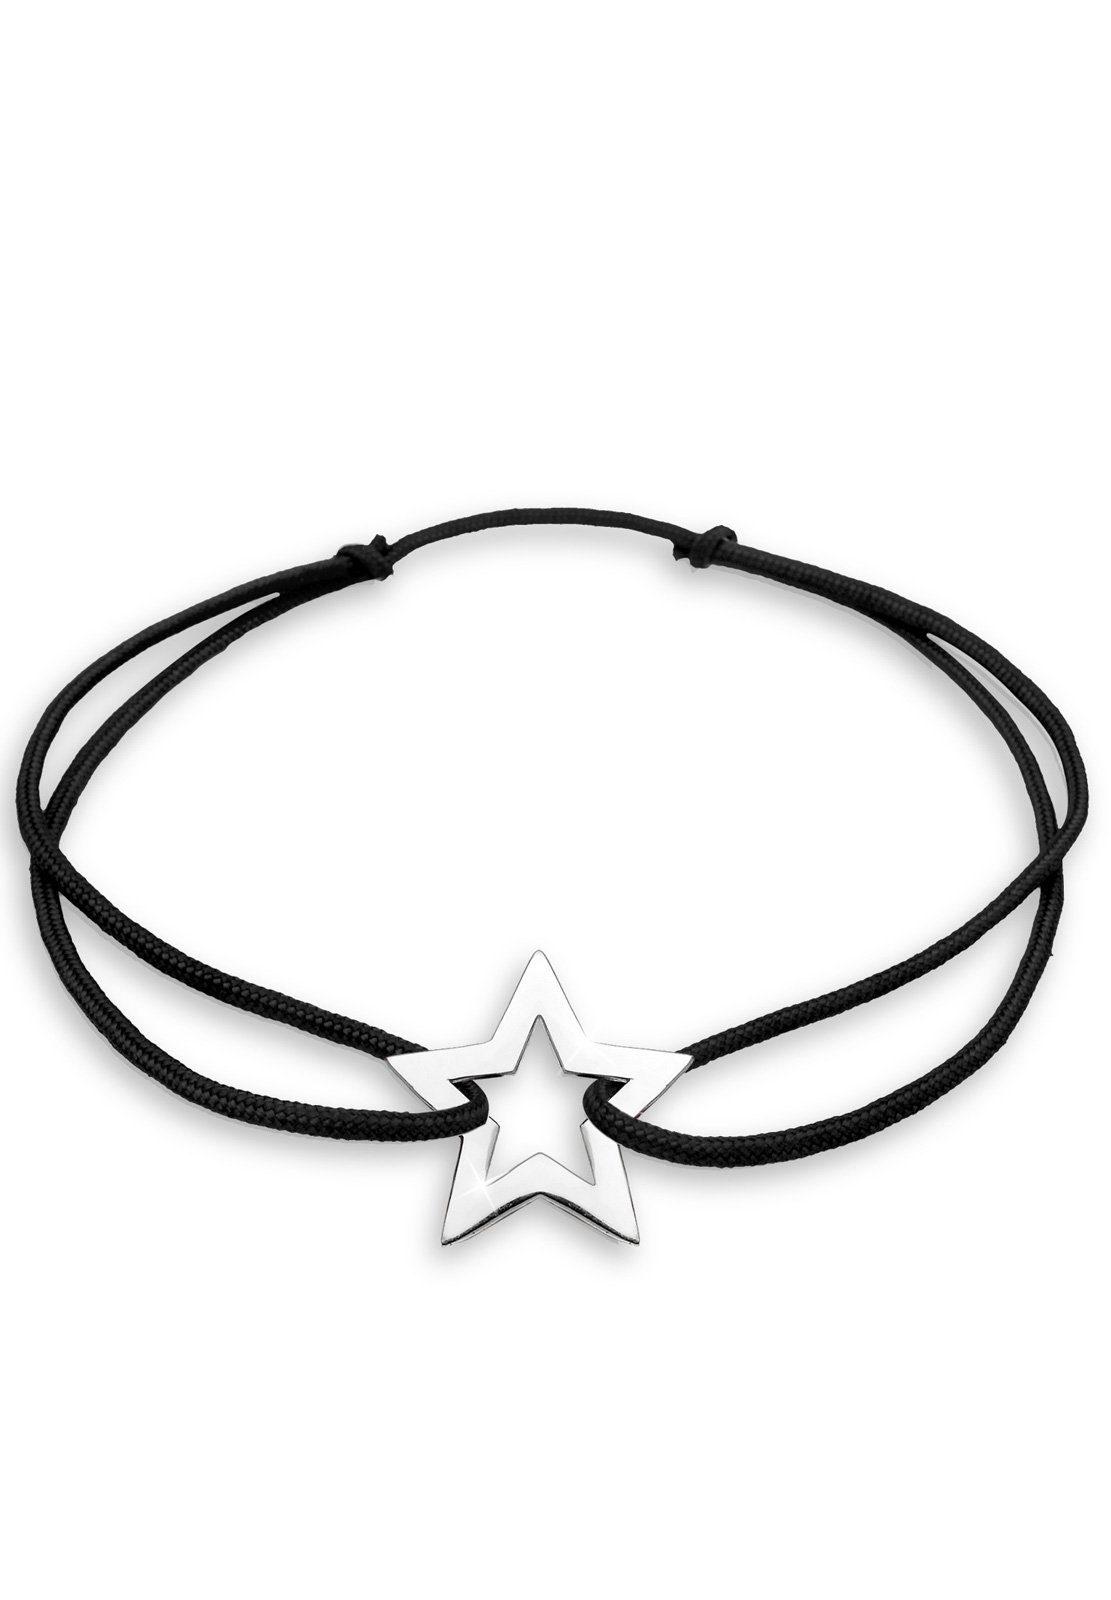 Nylon Astro Online Star Himmel Armband 925 Kaufen Elli Silber« »stern GUMqpSzVL